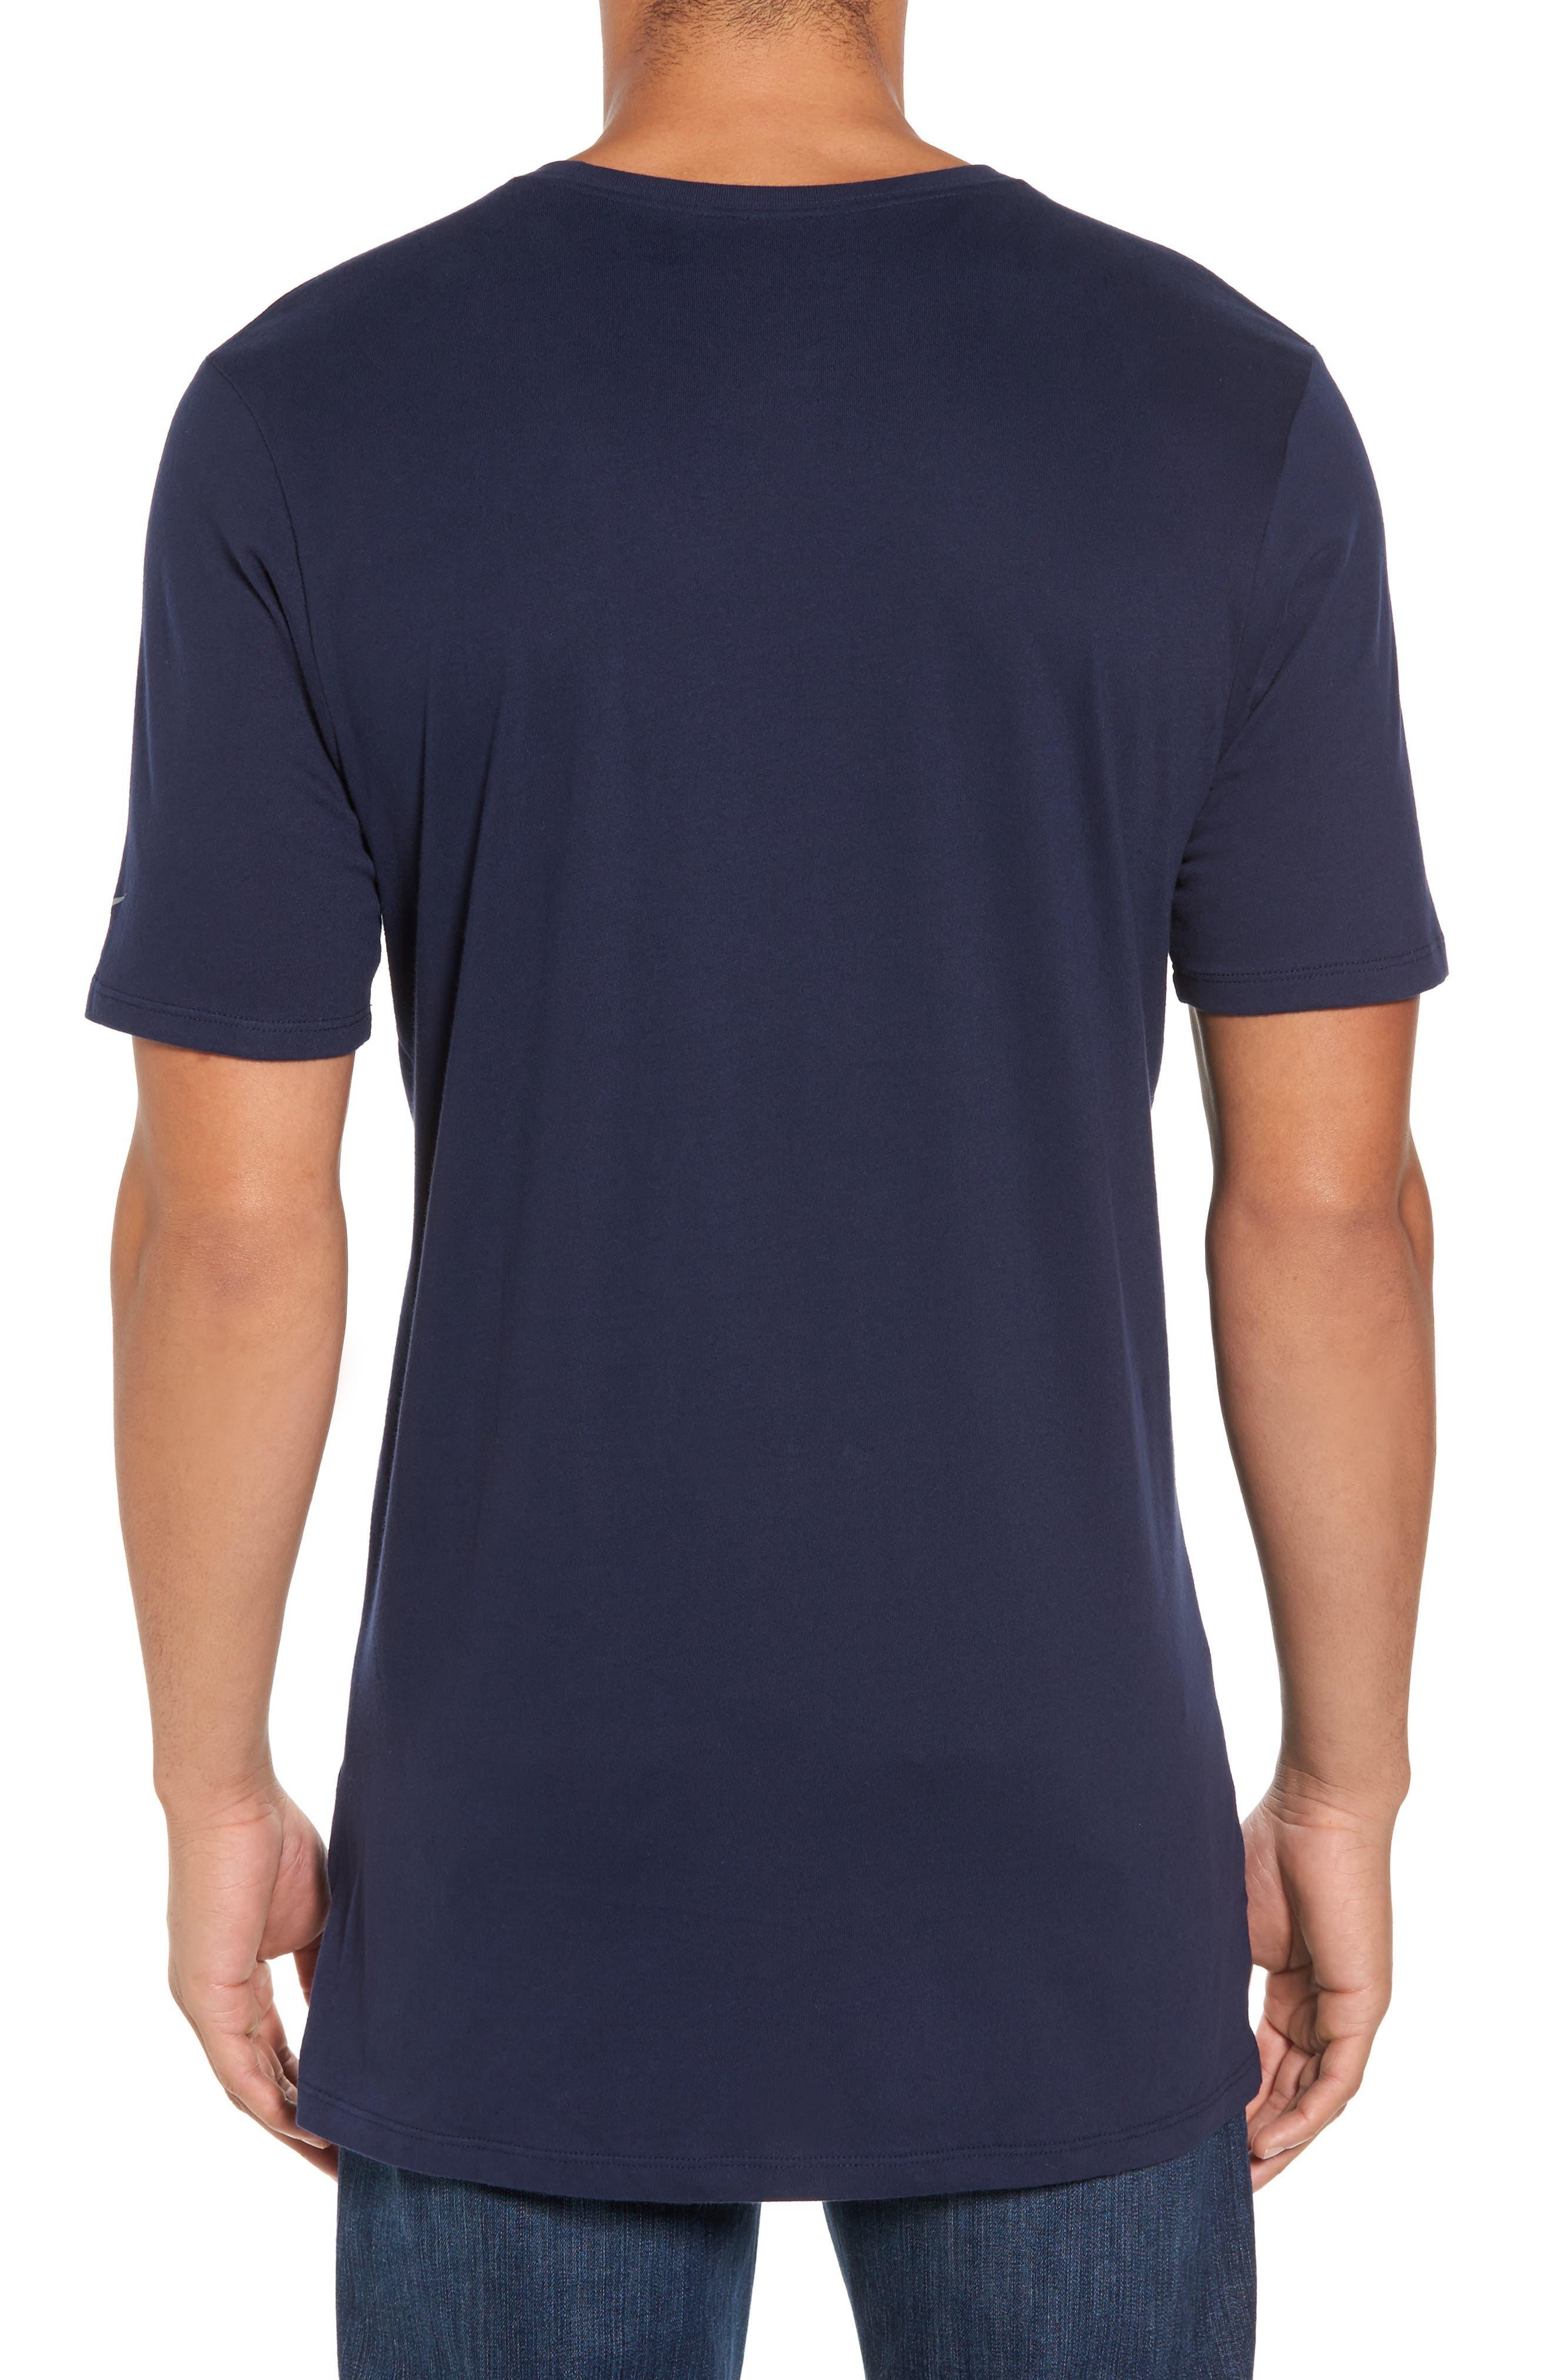 Alternate Image 2  - Nike NFL Team Graphic T-Shirt